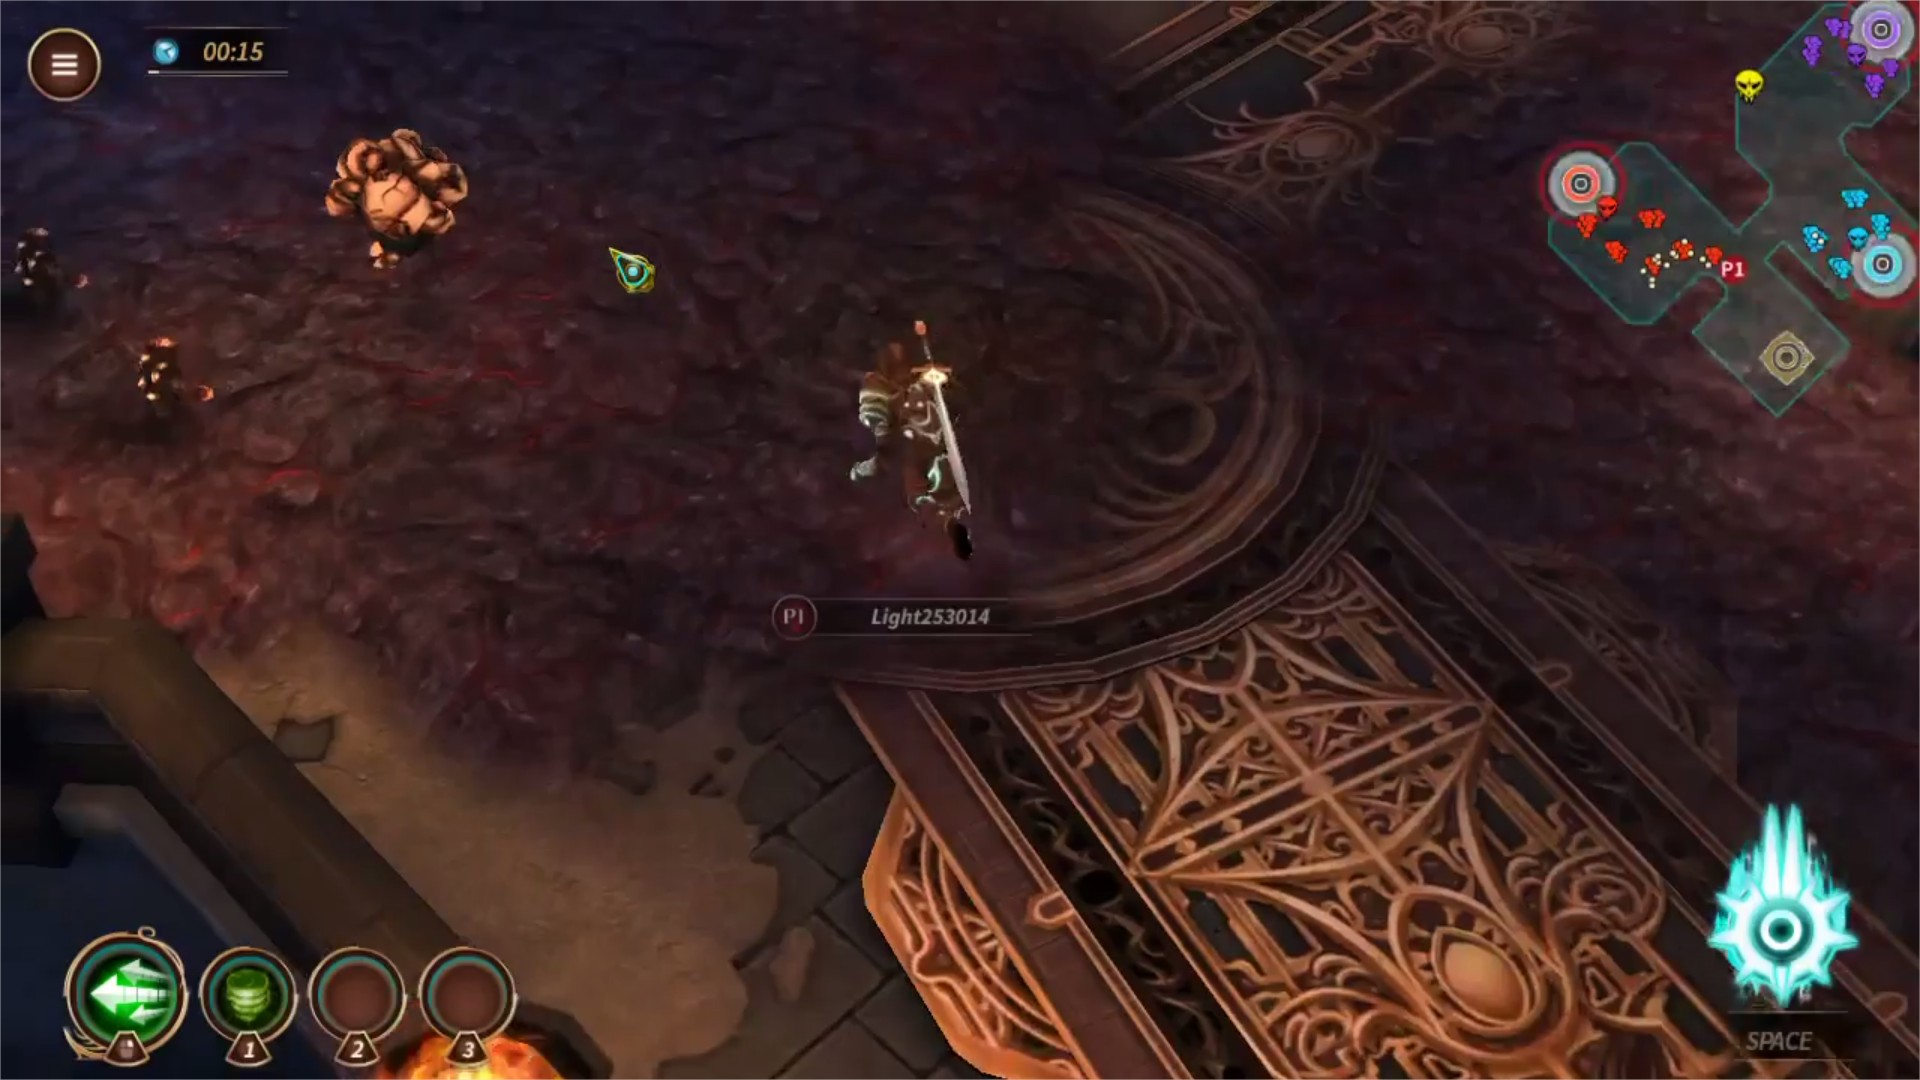 Lightbringers Saviours of Raia - Facebook gameplay PlayRawNow - YouTube - Opera_4.jpg